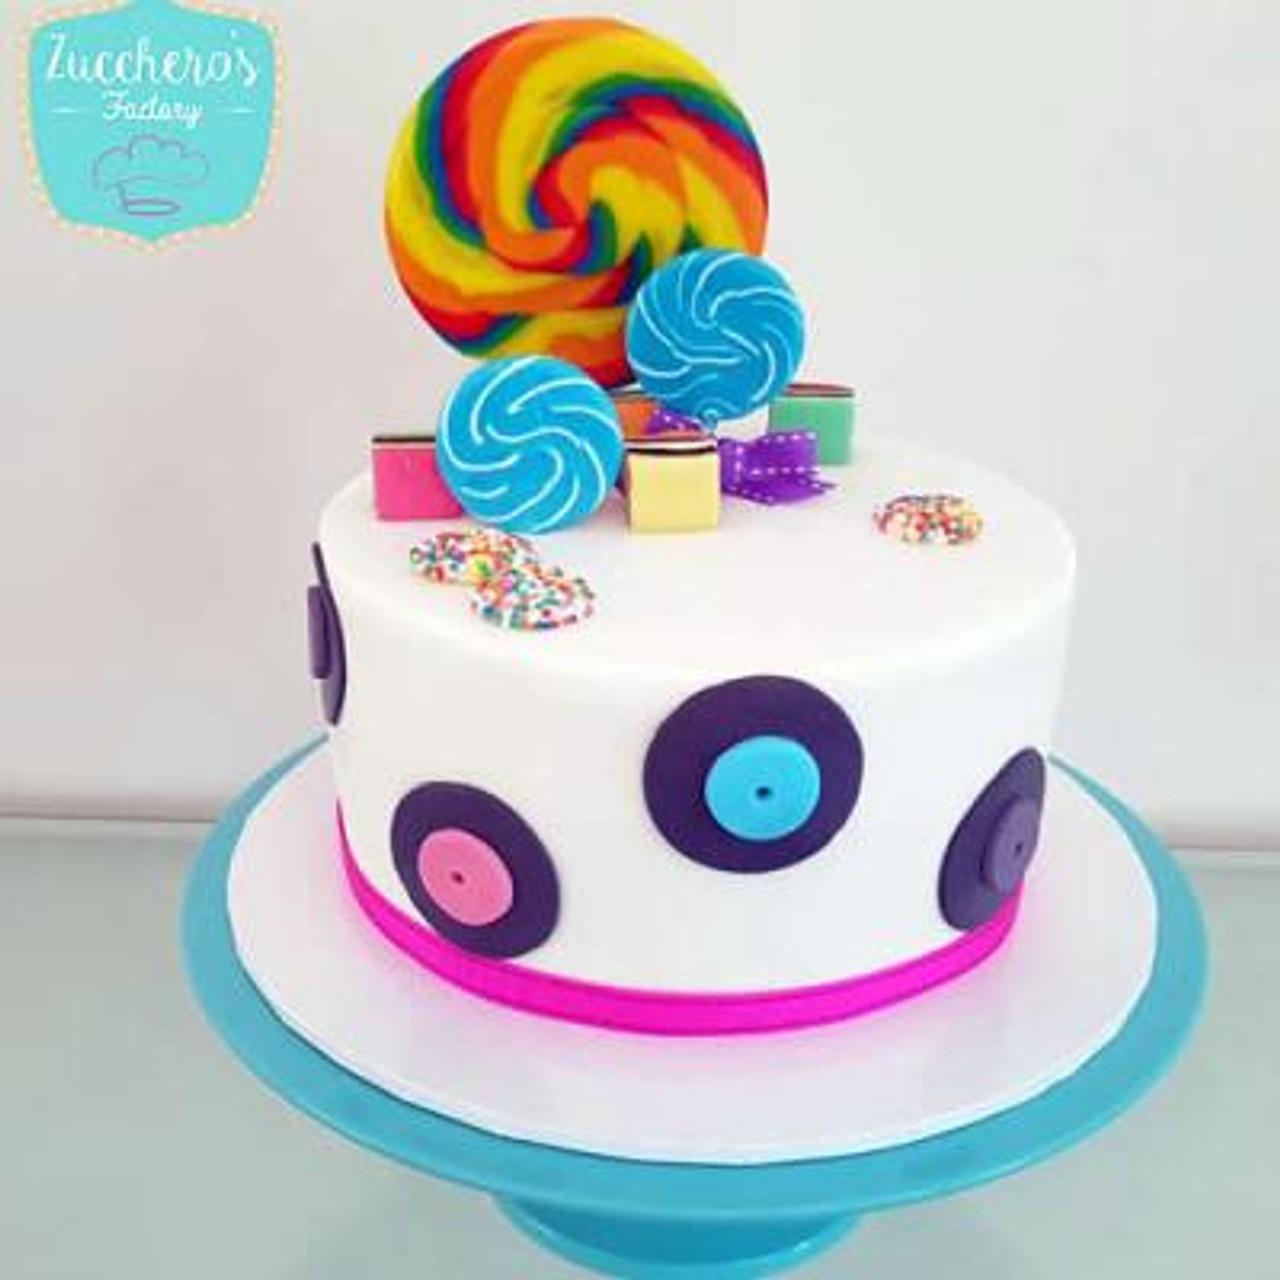 Tremendous Disco Party Buttercream Cake Zuccheros Funny Birthday Cards Online Hendilapandamsfinfo